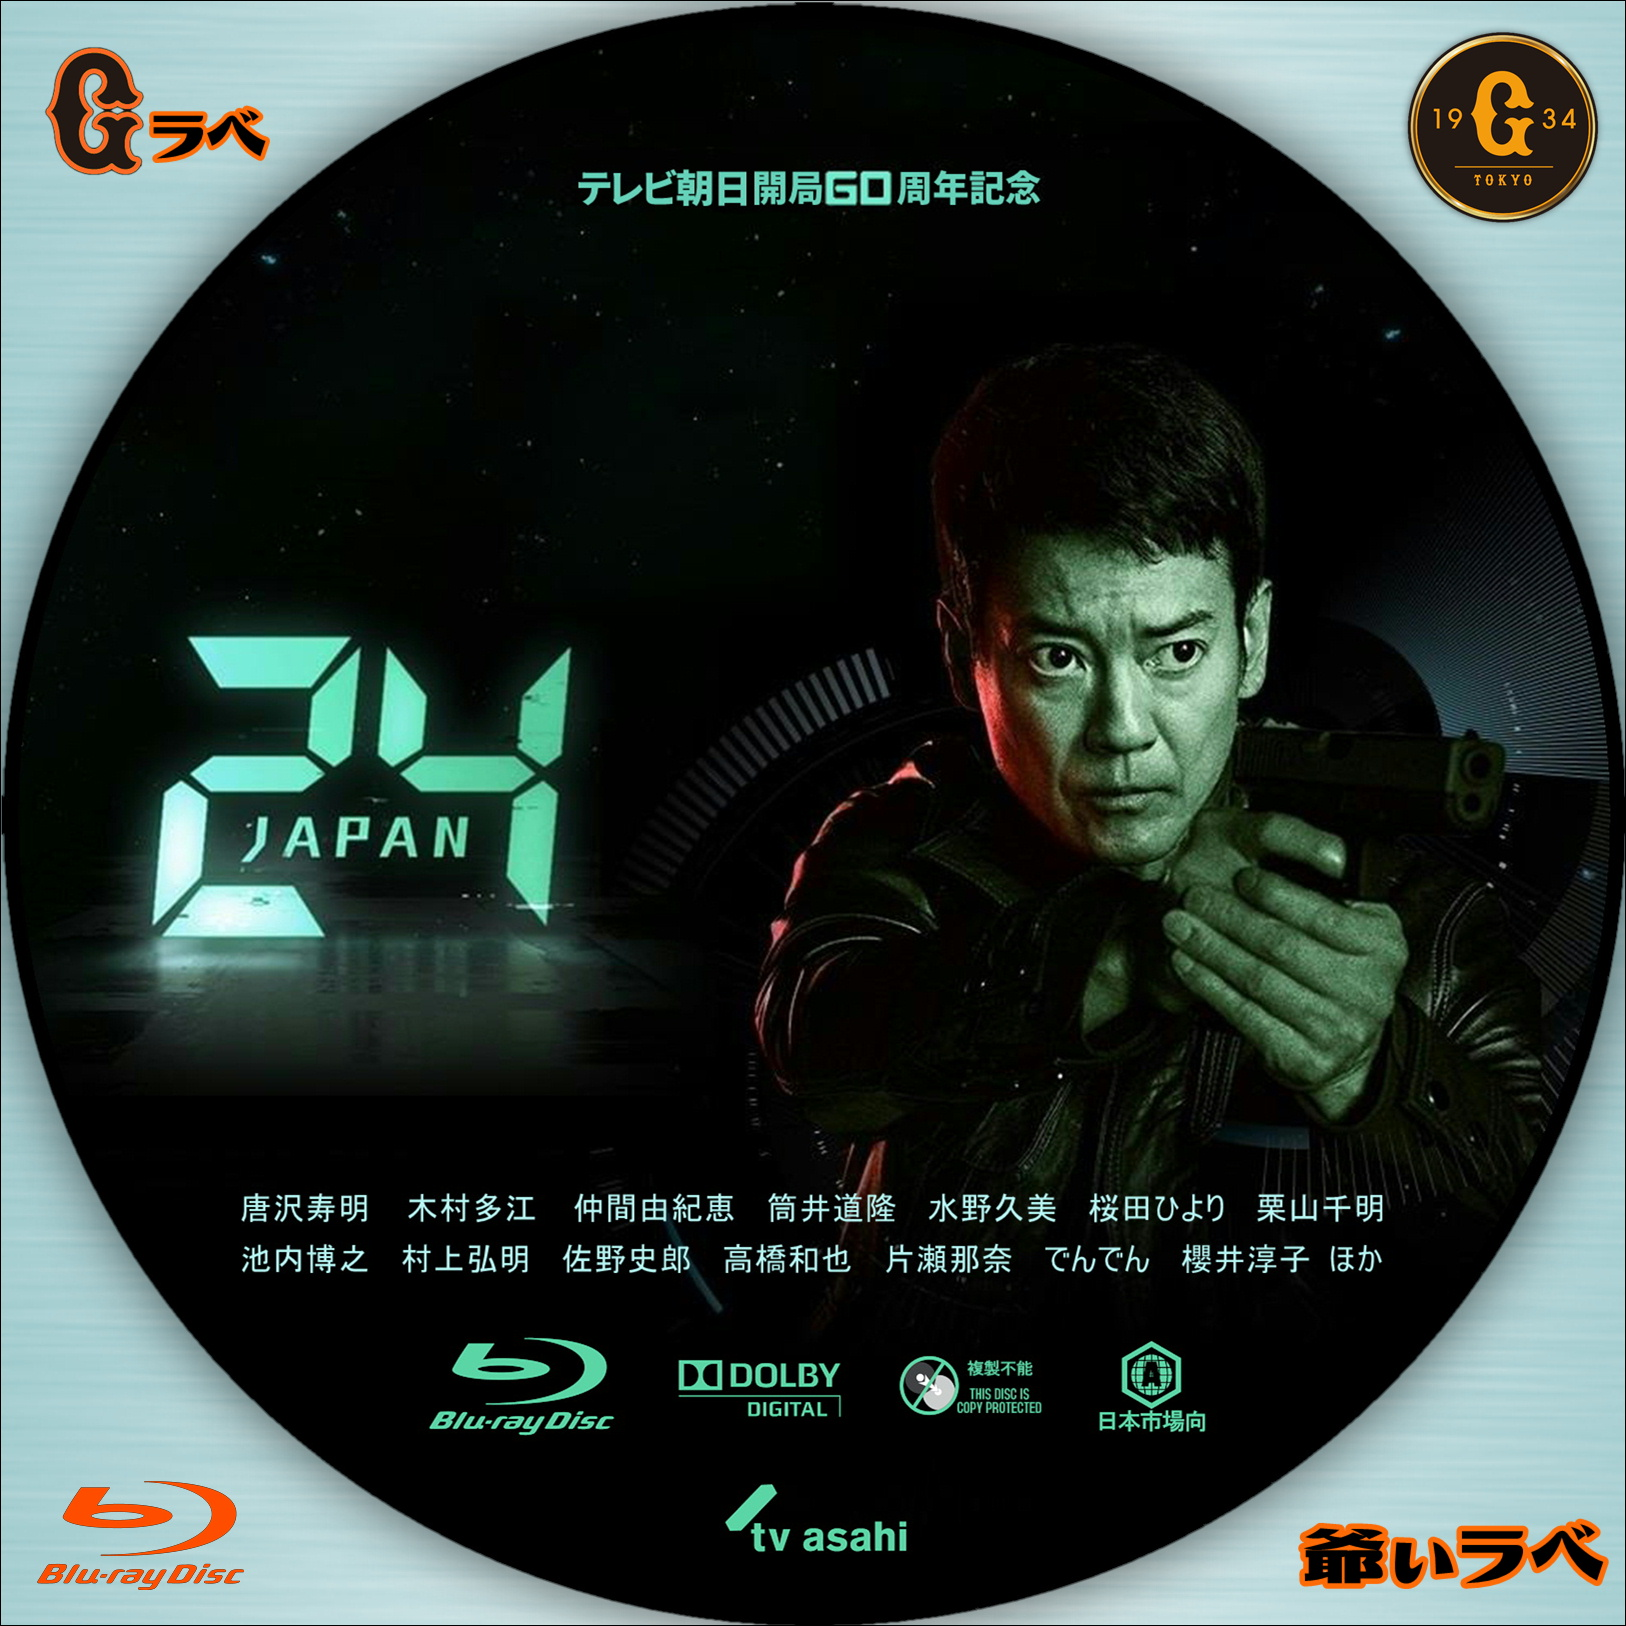 24 JAPAN 修正版(Blu-ray)